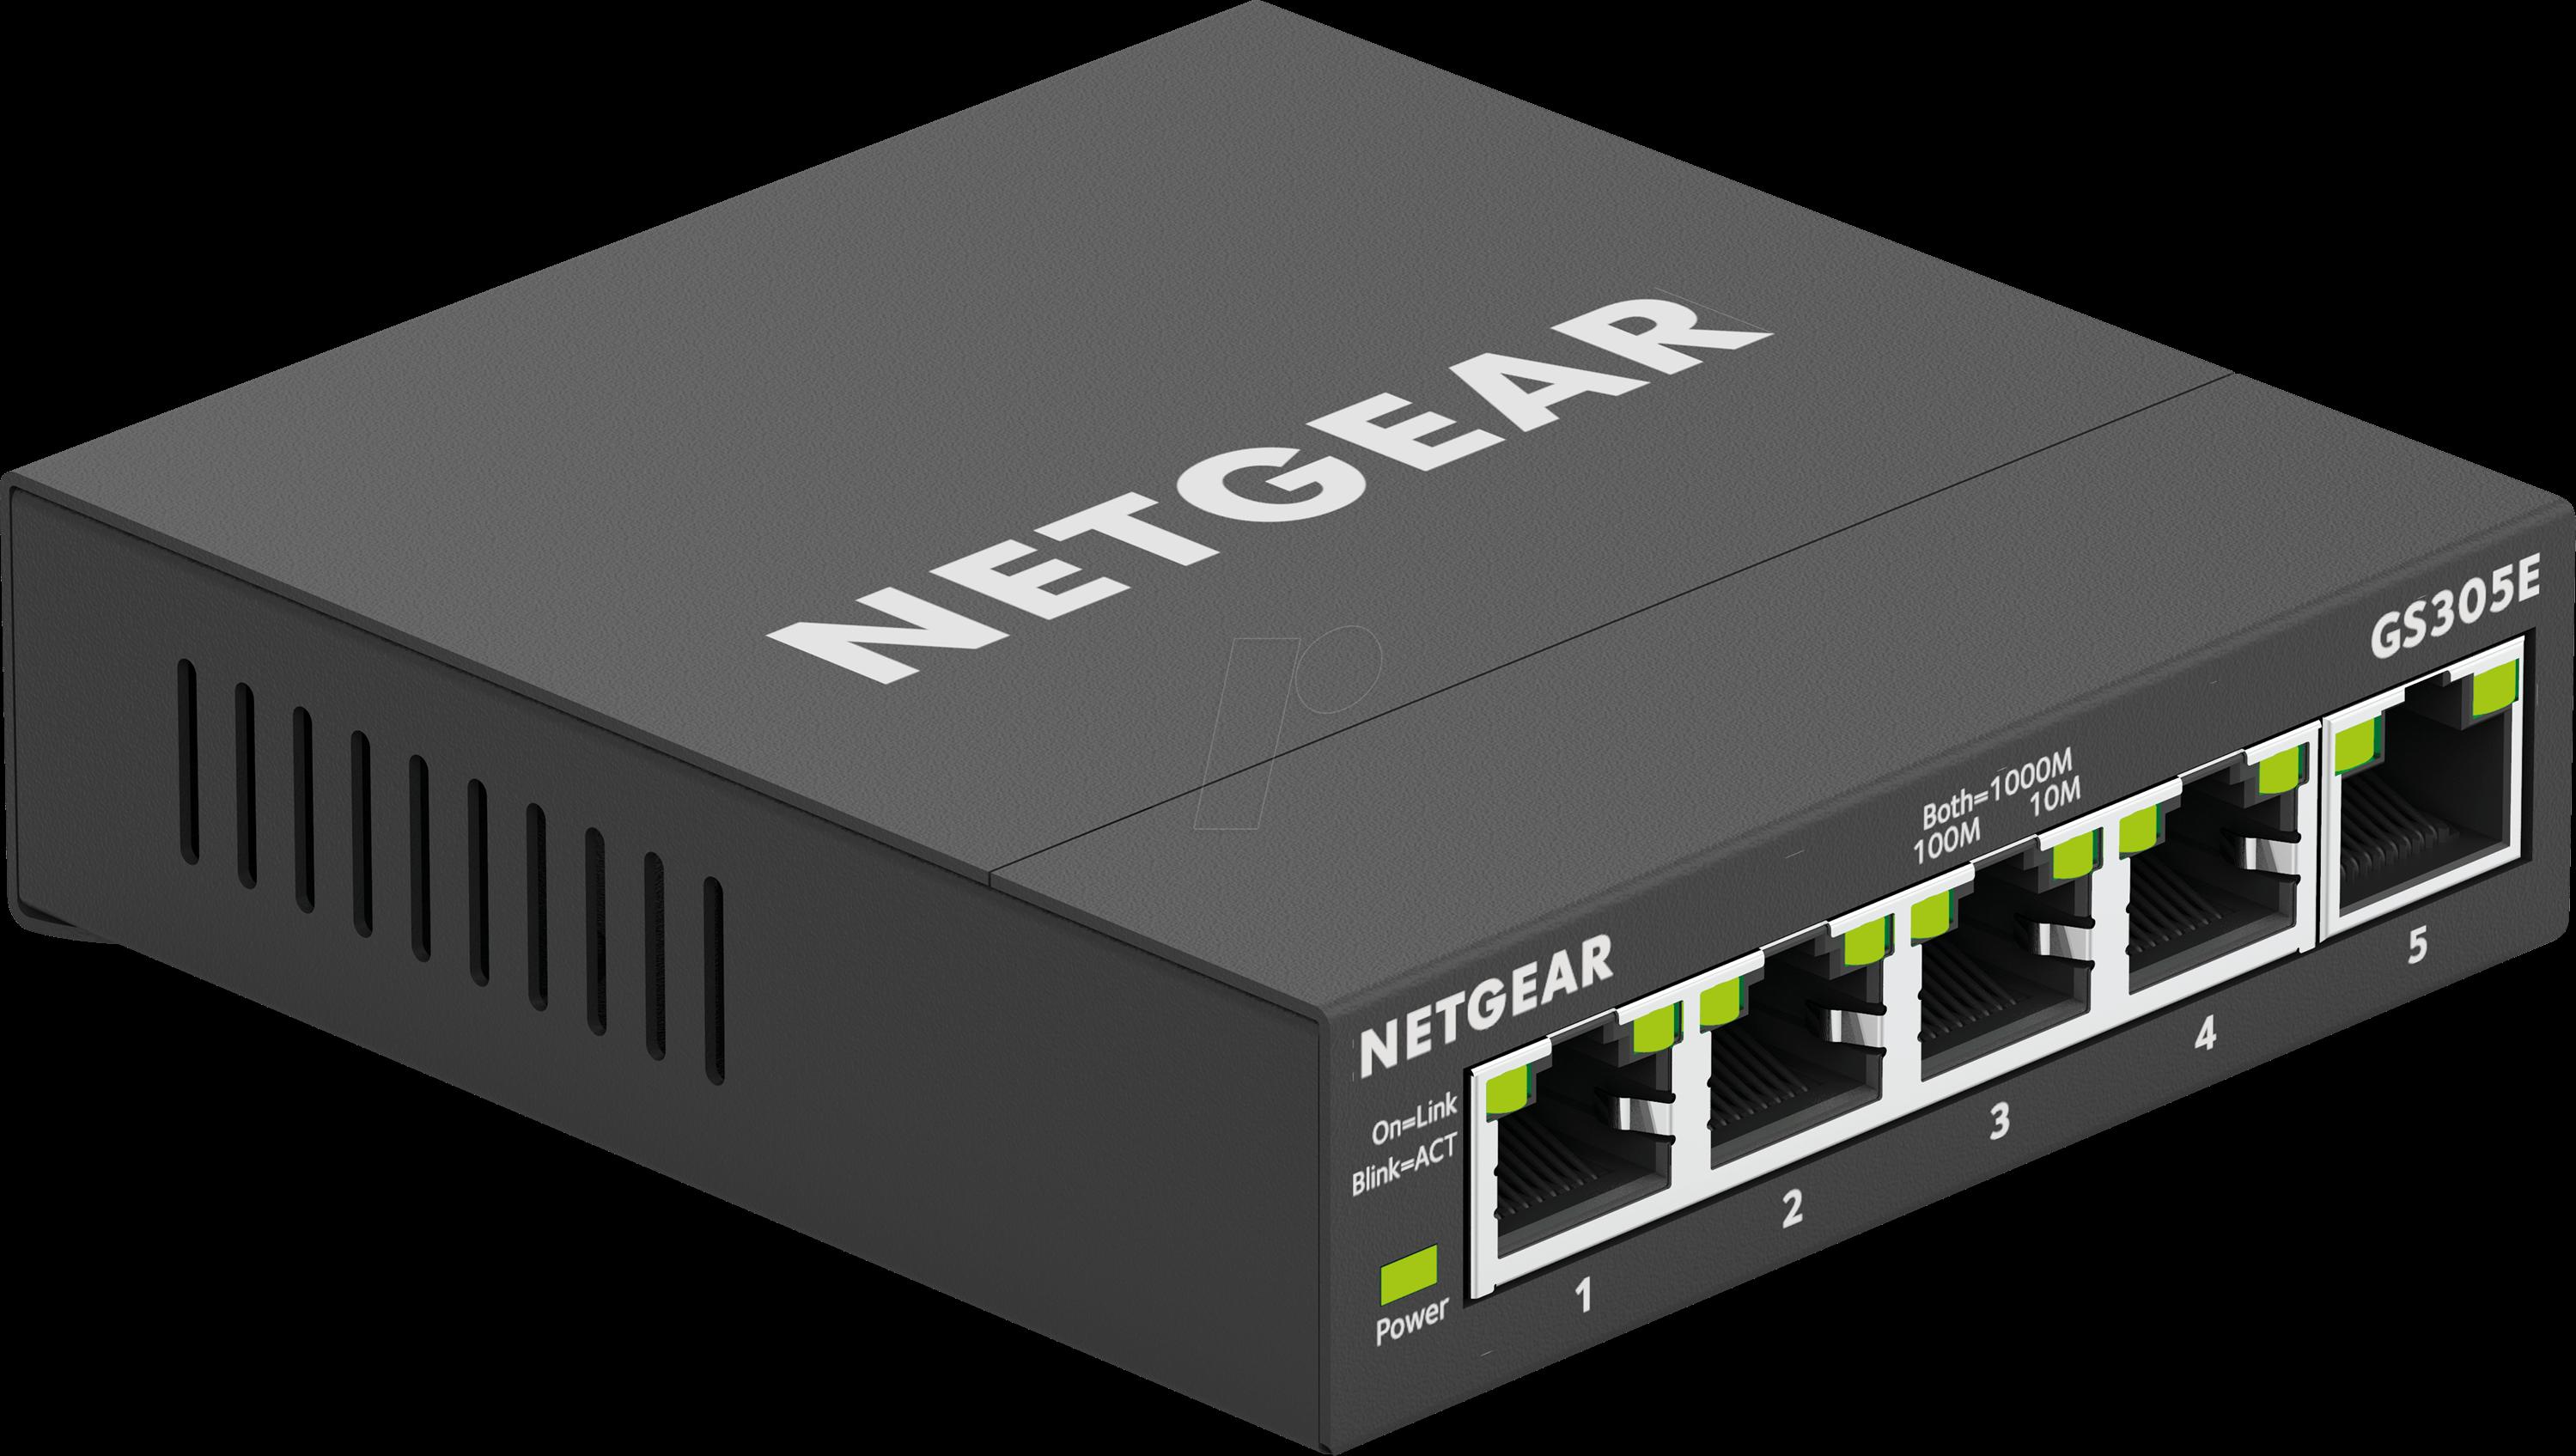 NETGEAR GS305E - Switch, 5-Port, Gigabit Ethernet